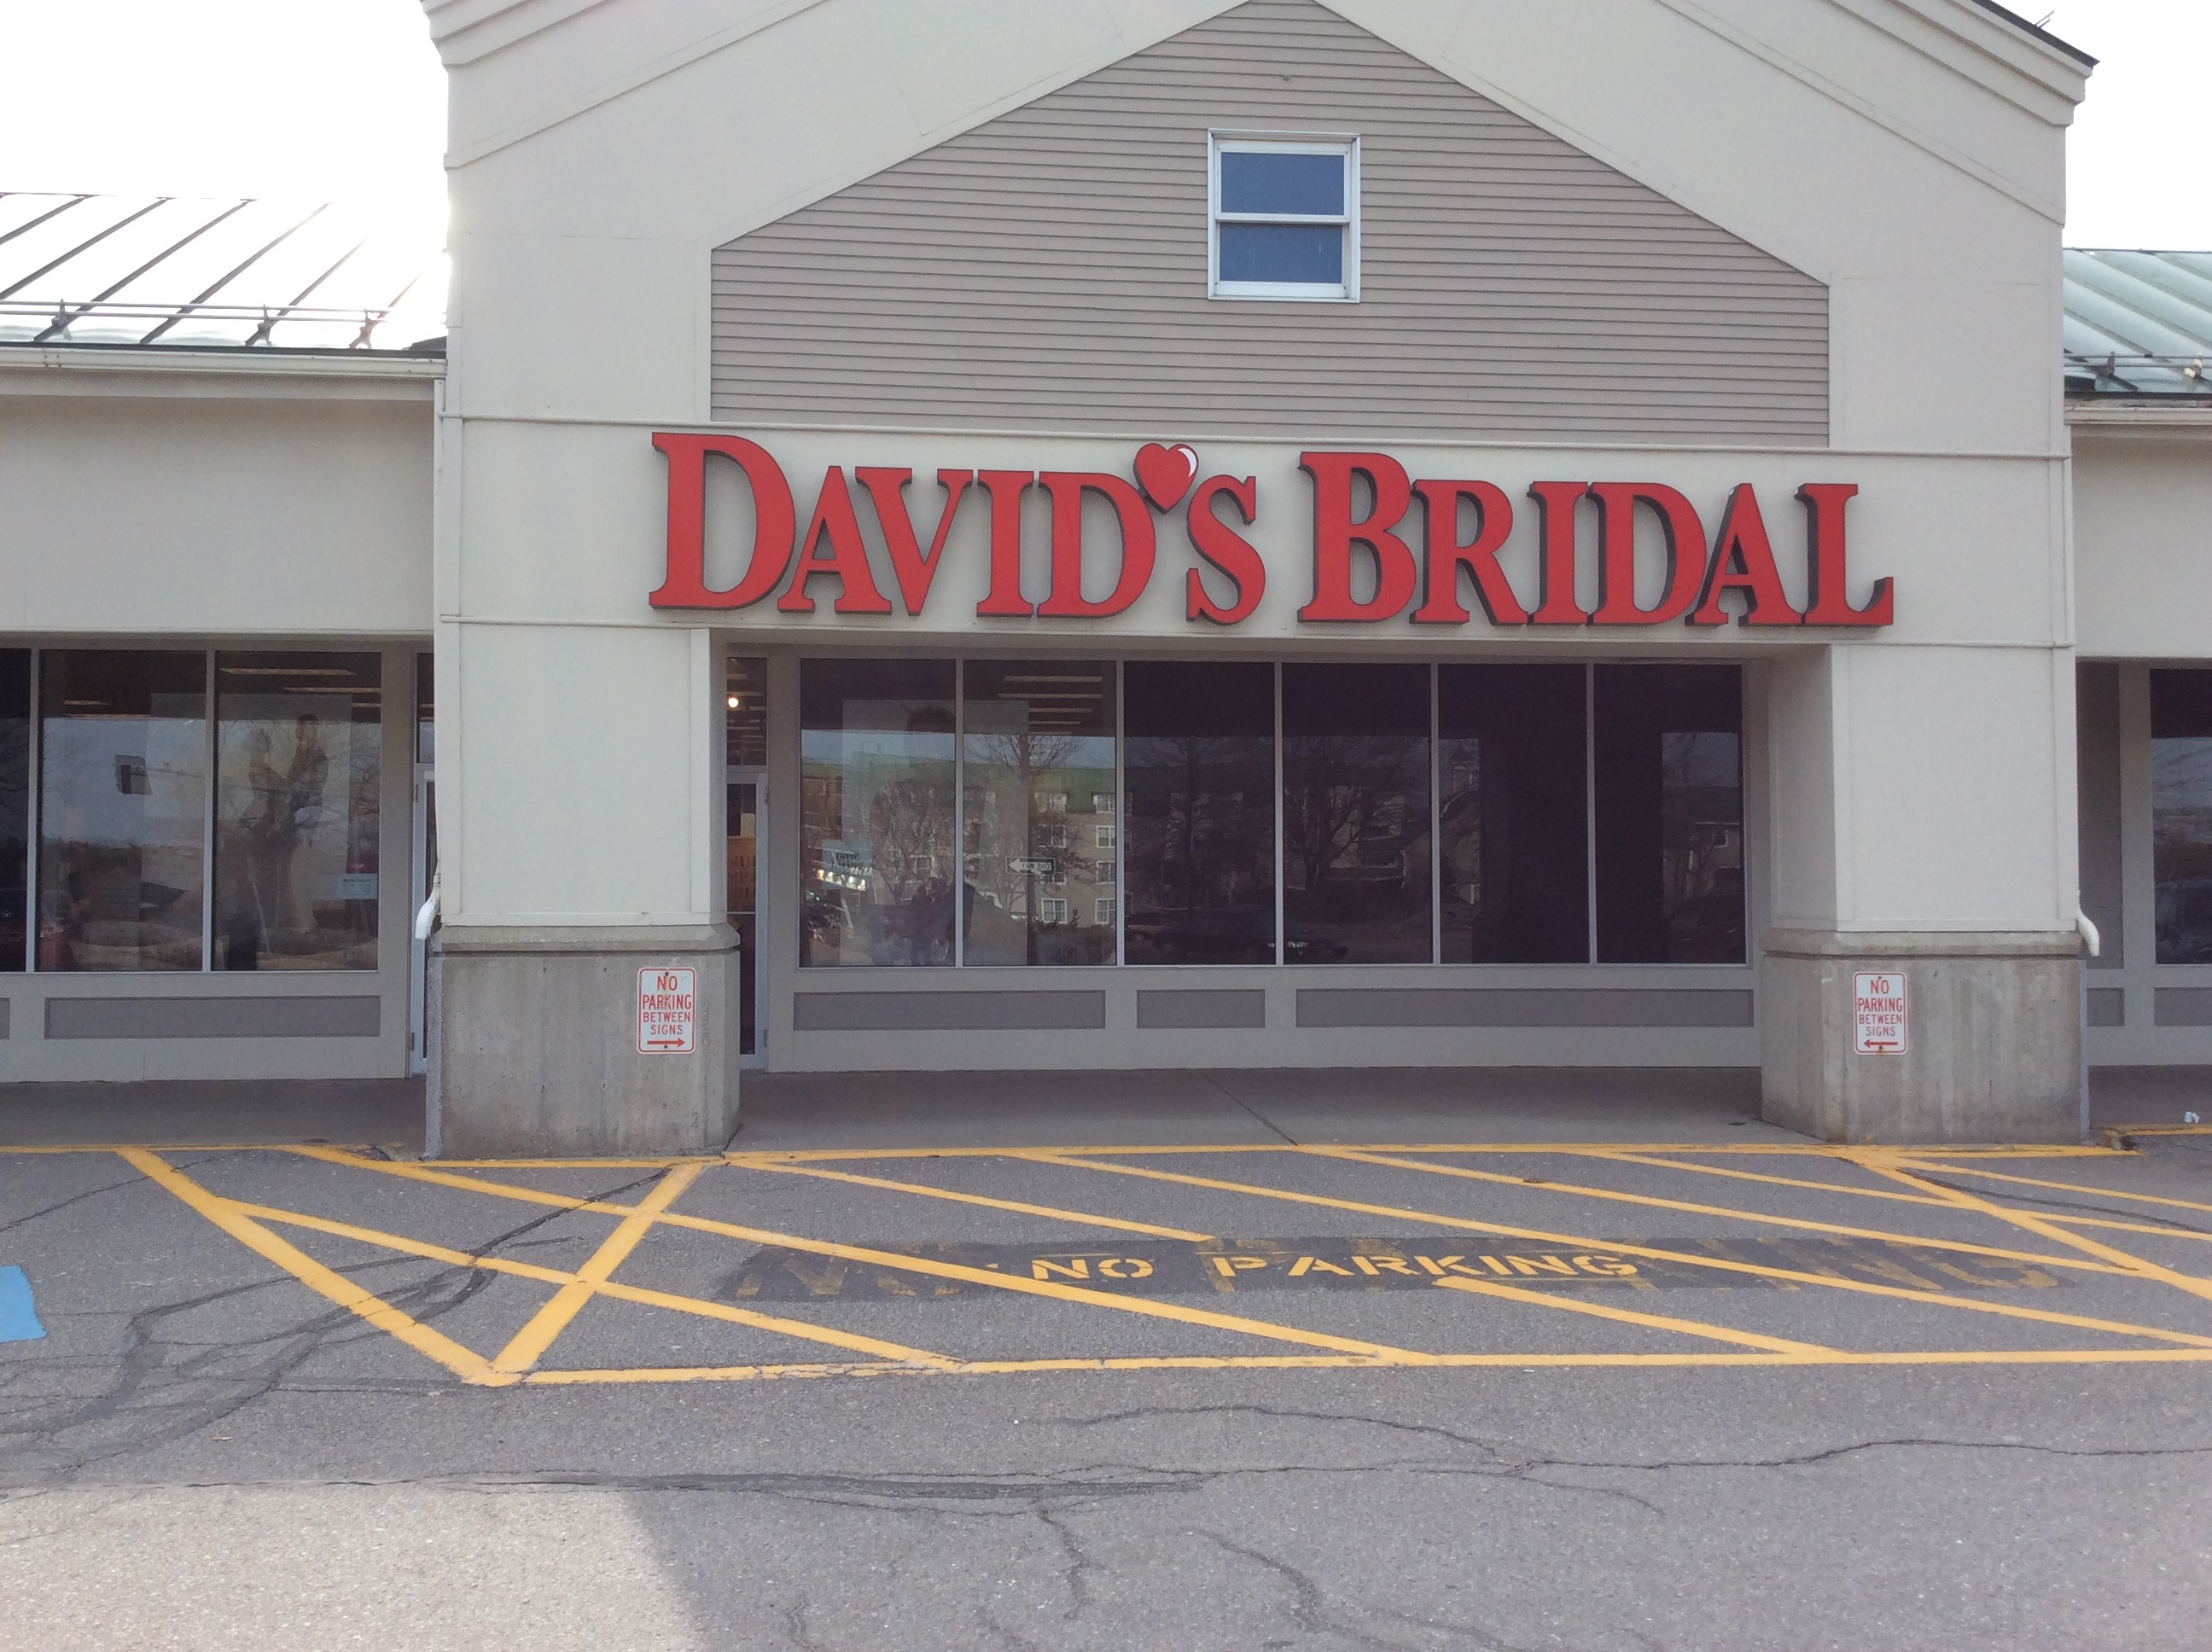 DAVIDS BRIDAL SOUTH BURLINGTON